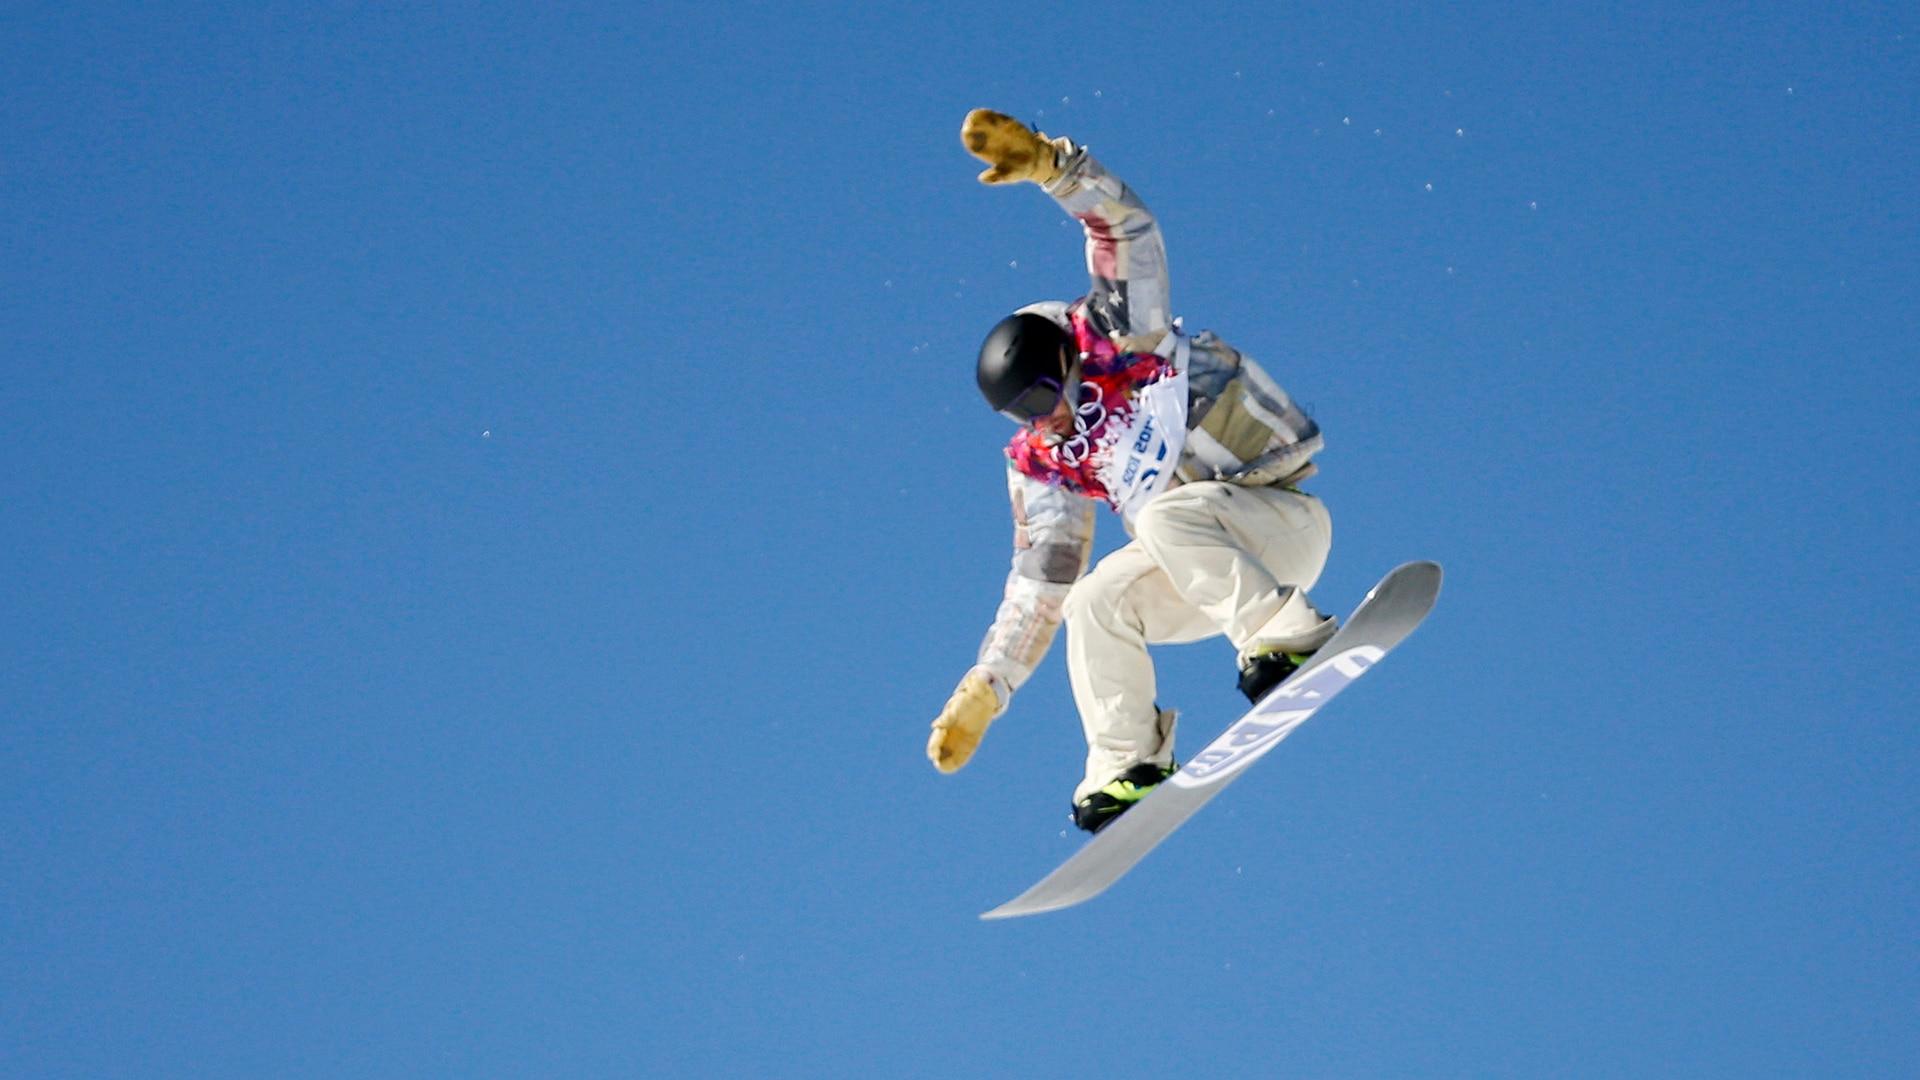 Sage Kotsenburg during his first run of men's slopestyle finals